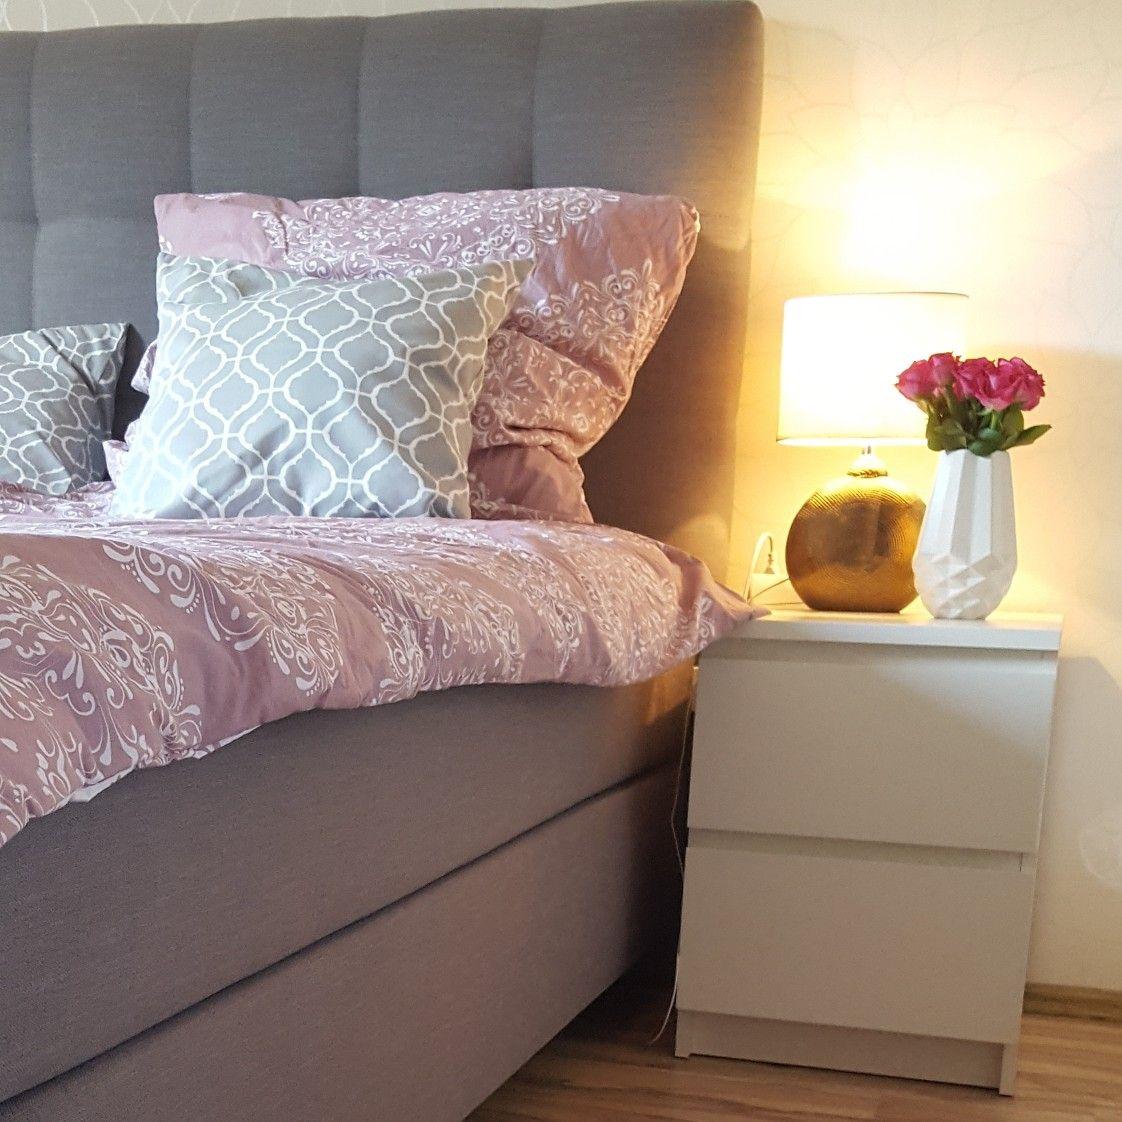 Boxspringbett ikea grau  Schlafzimmer / Bedroom: rosa grau, IKEA, schlaraffia Boxspringbett ...